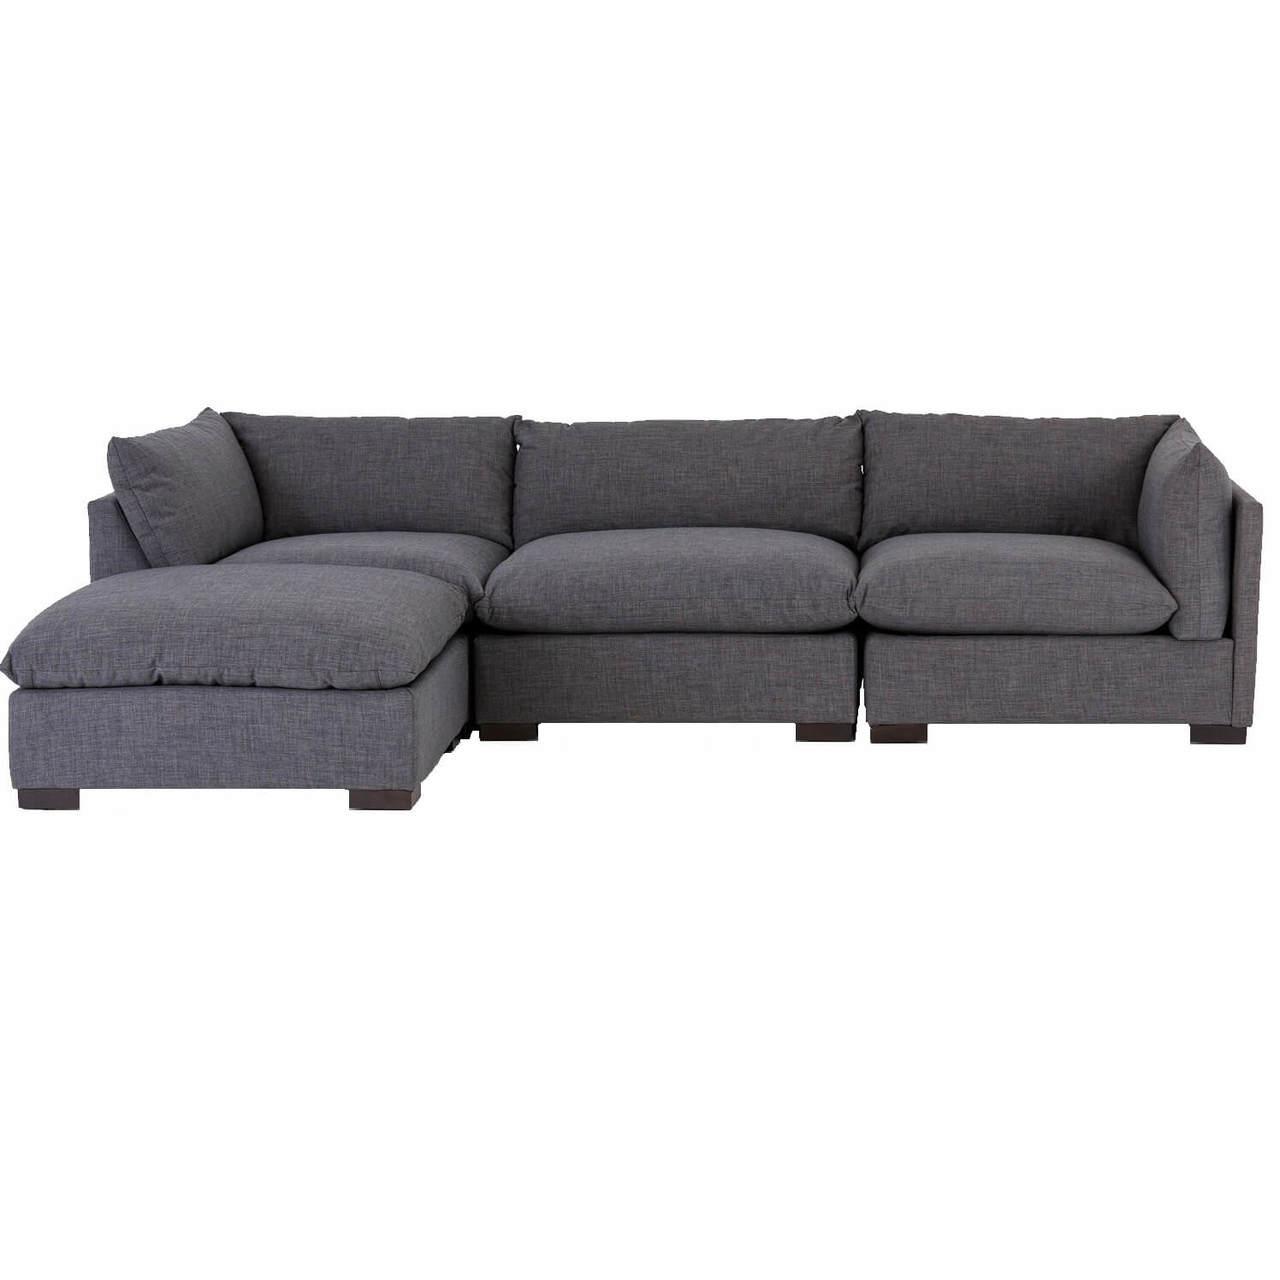 westworld modern gray 4 piece modular lounge sectional sofa